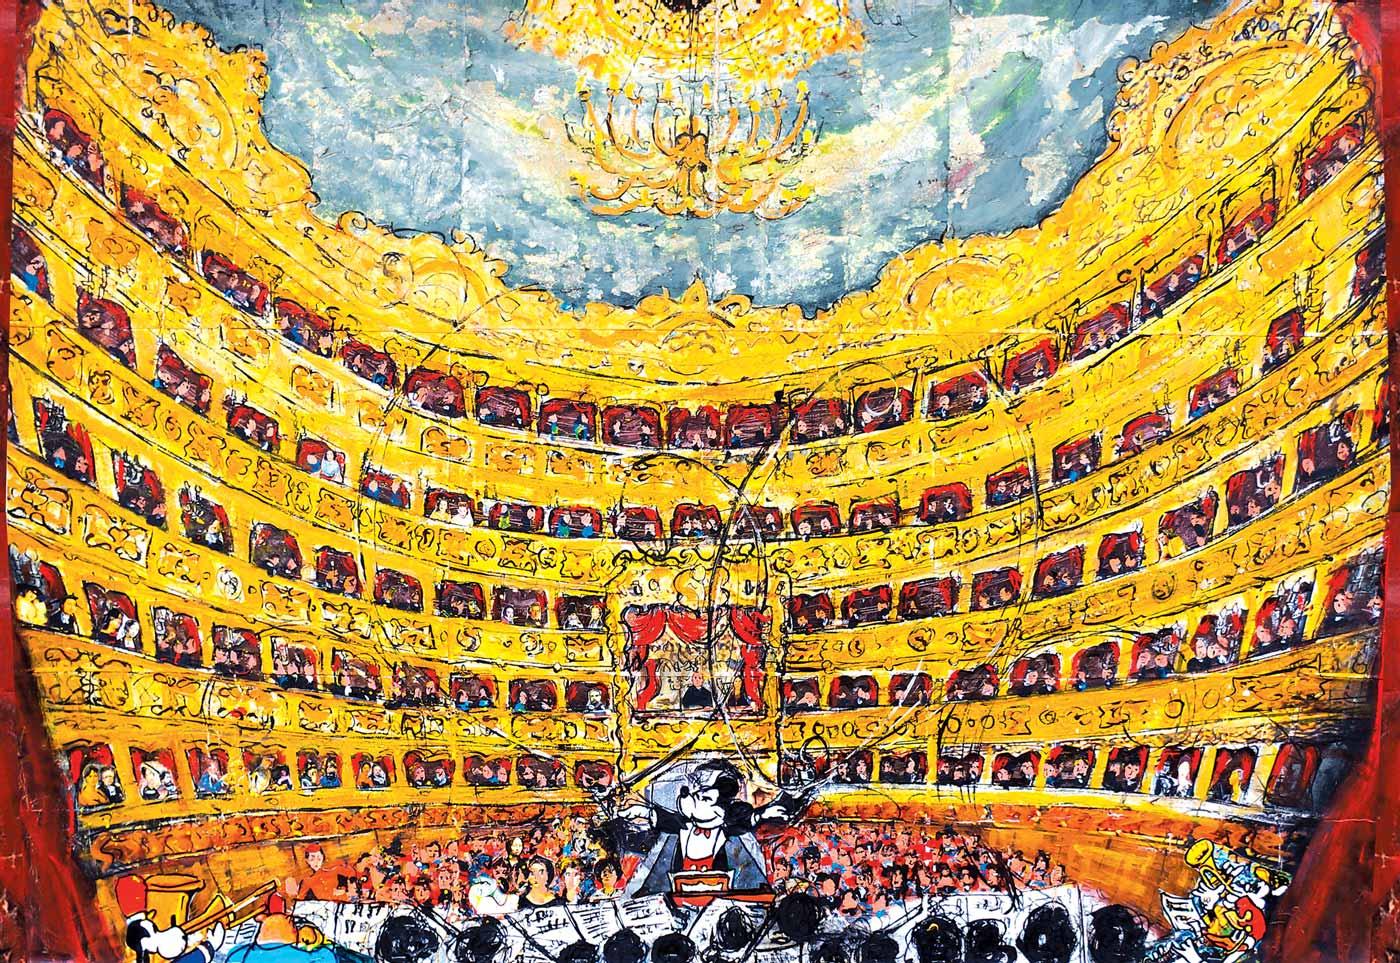 Paolo Franzoso - Fantasia all'opera